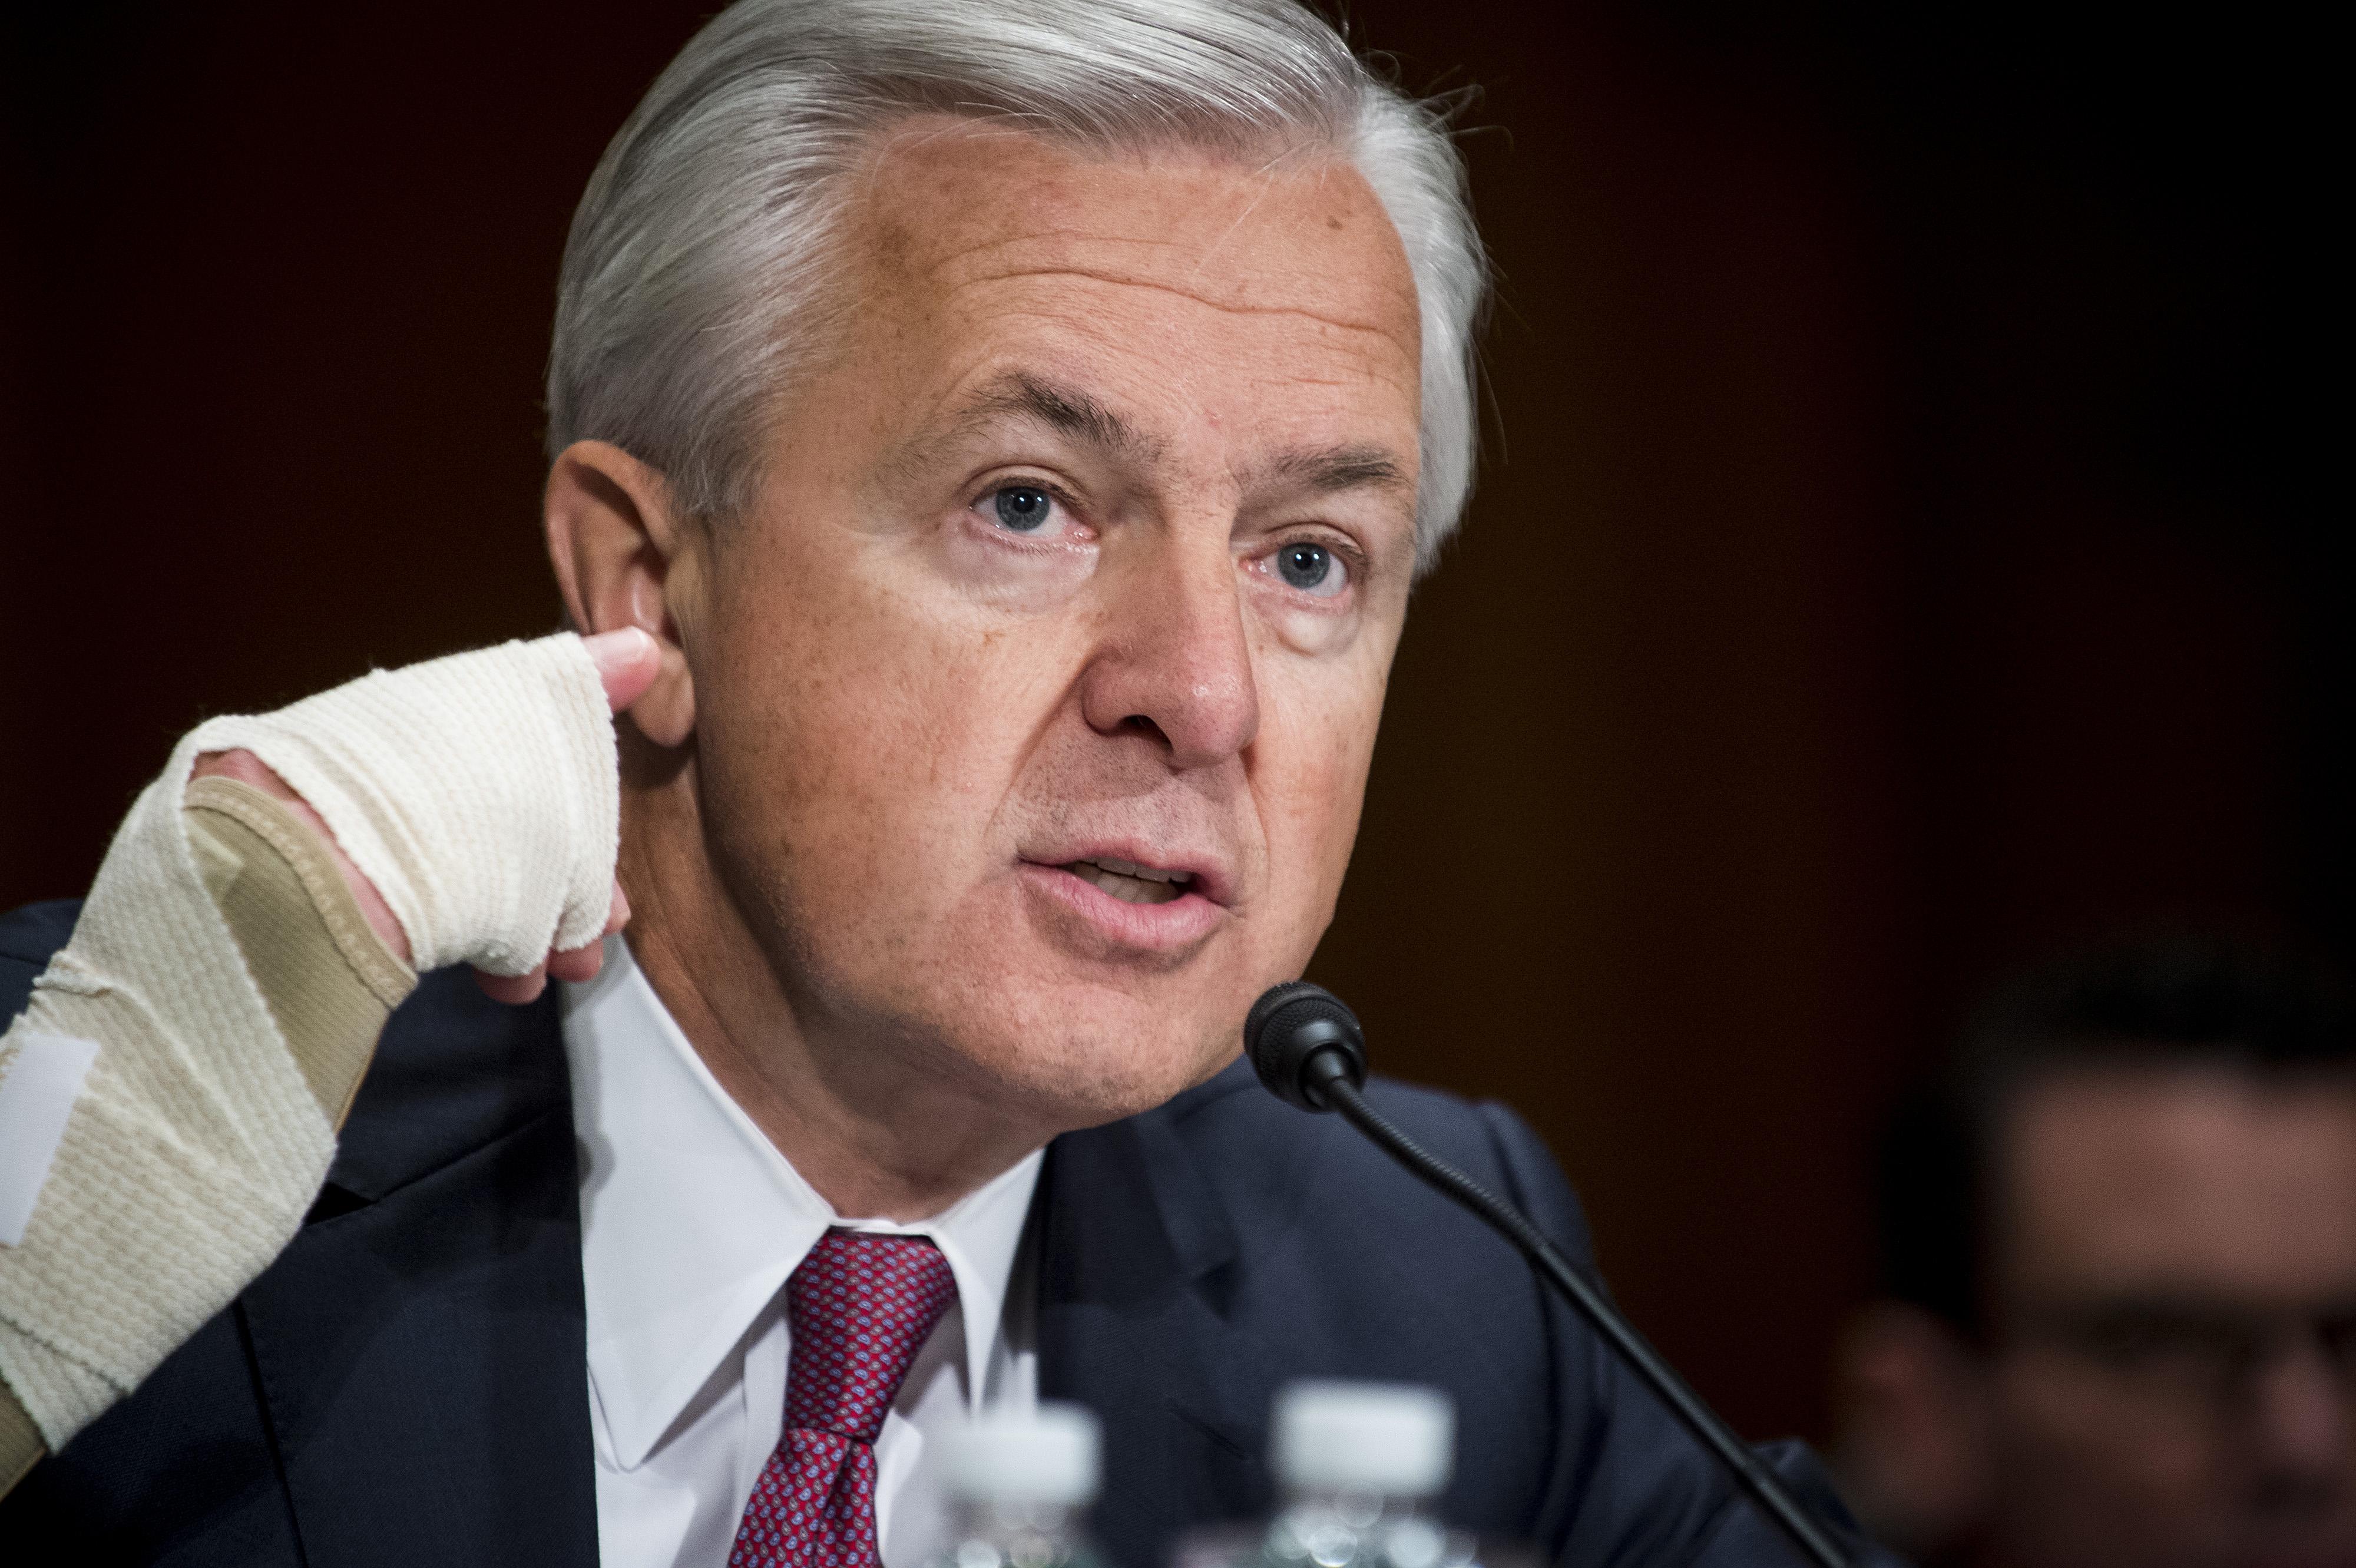 Wells Fargo CEO John Stumpf Testifies To Senate Banking Committee Over Alleged Misconduct